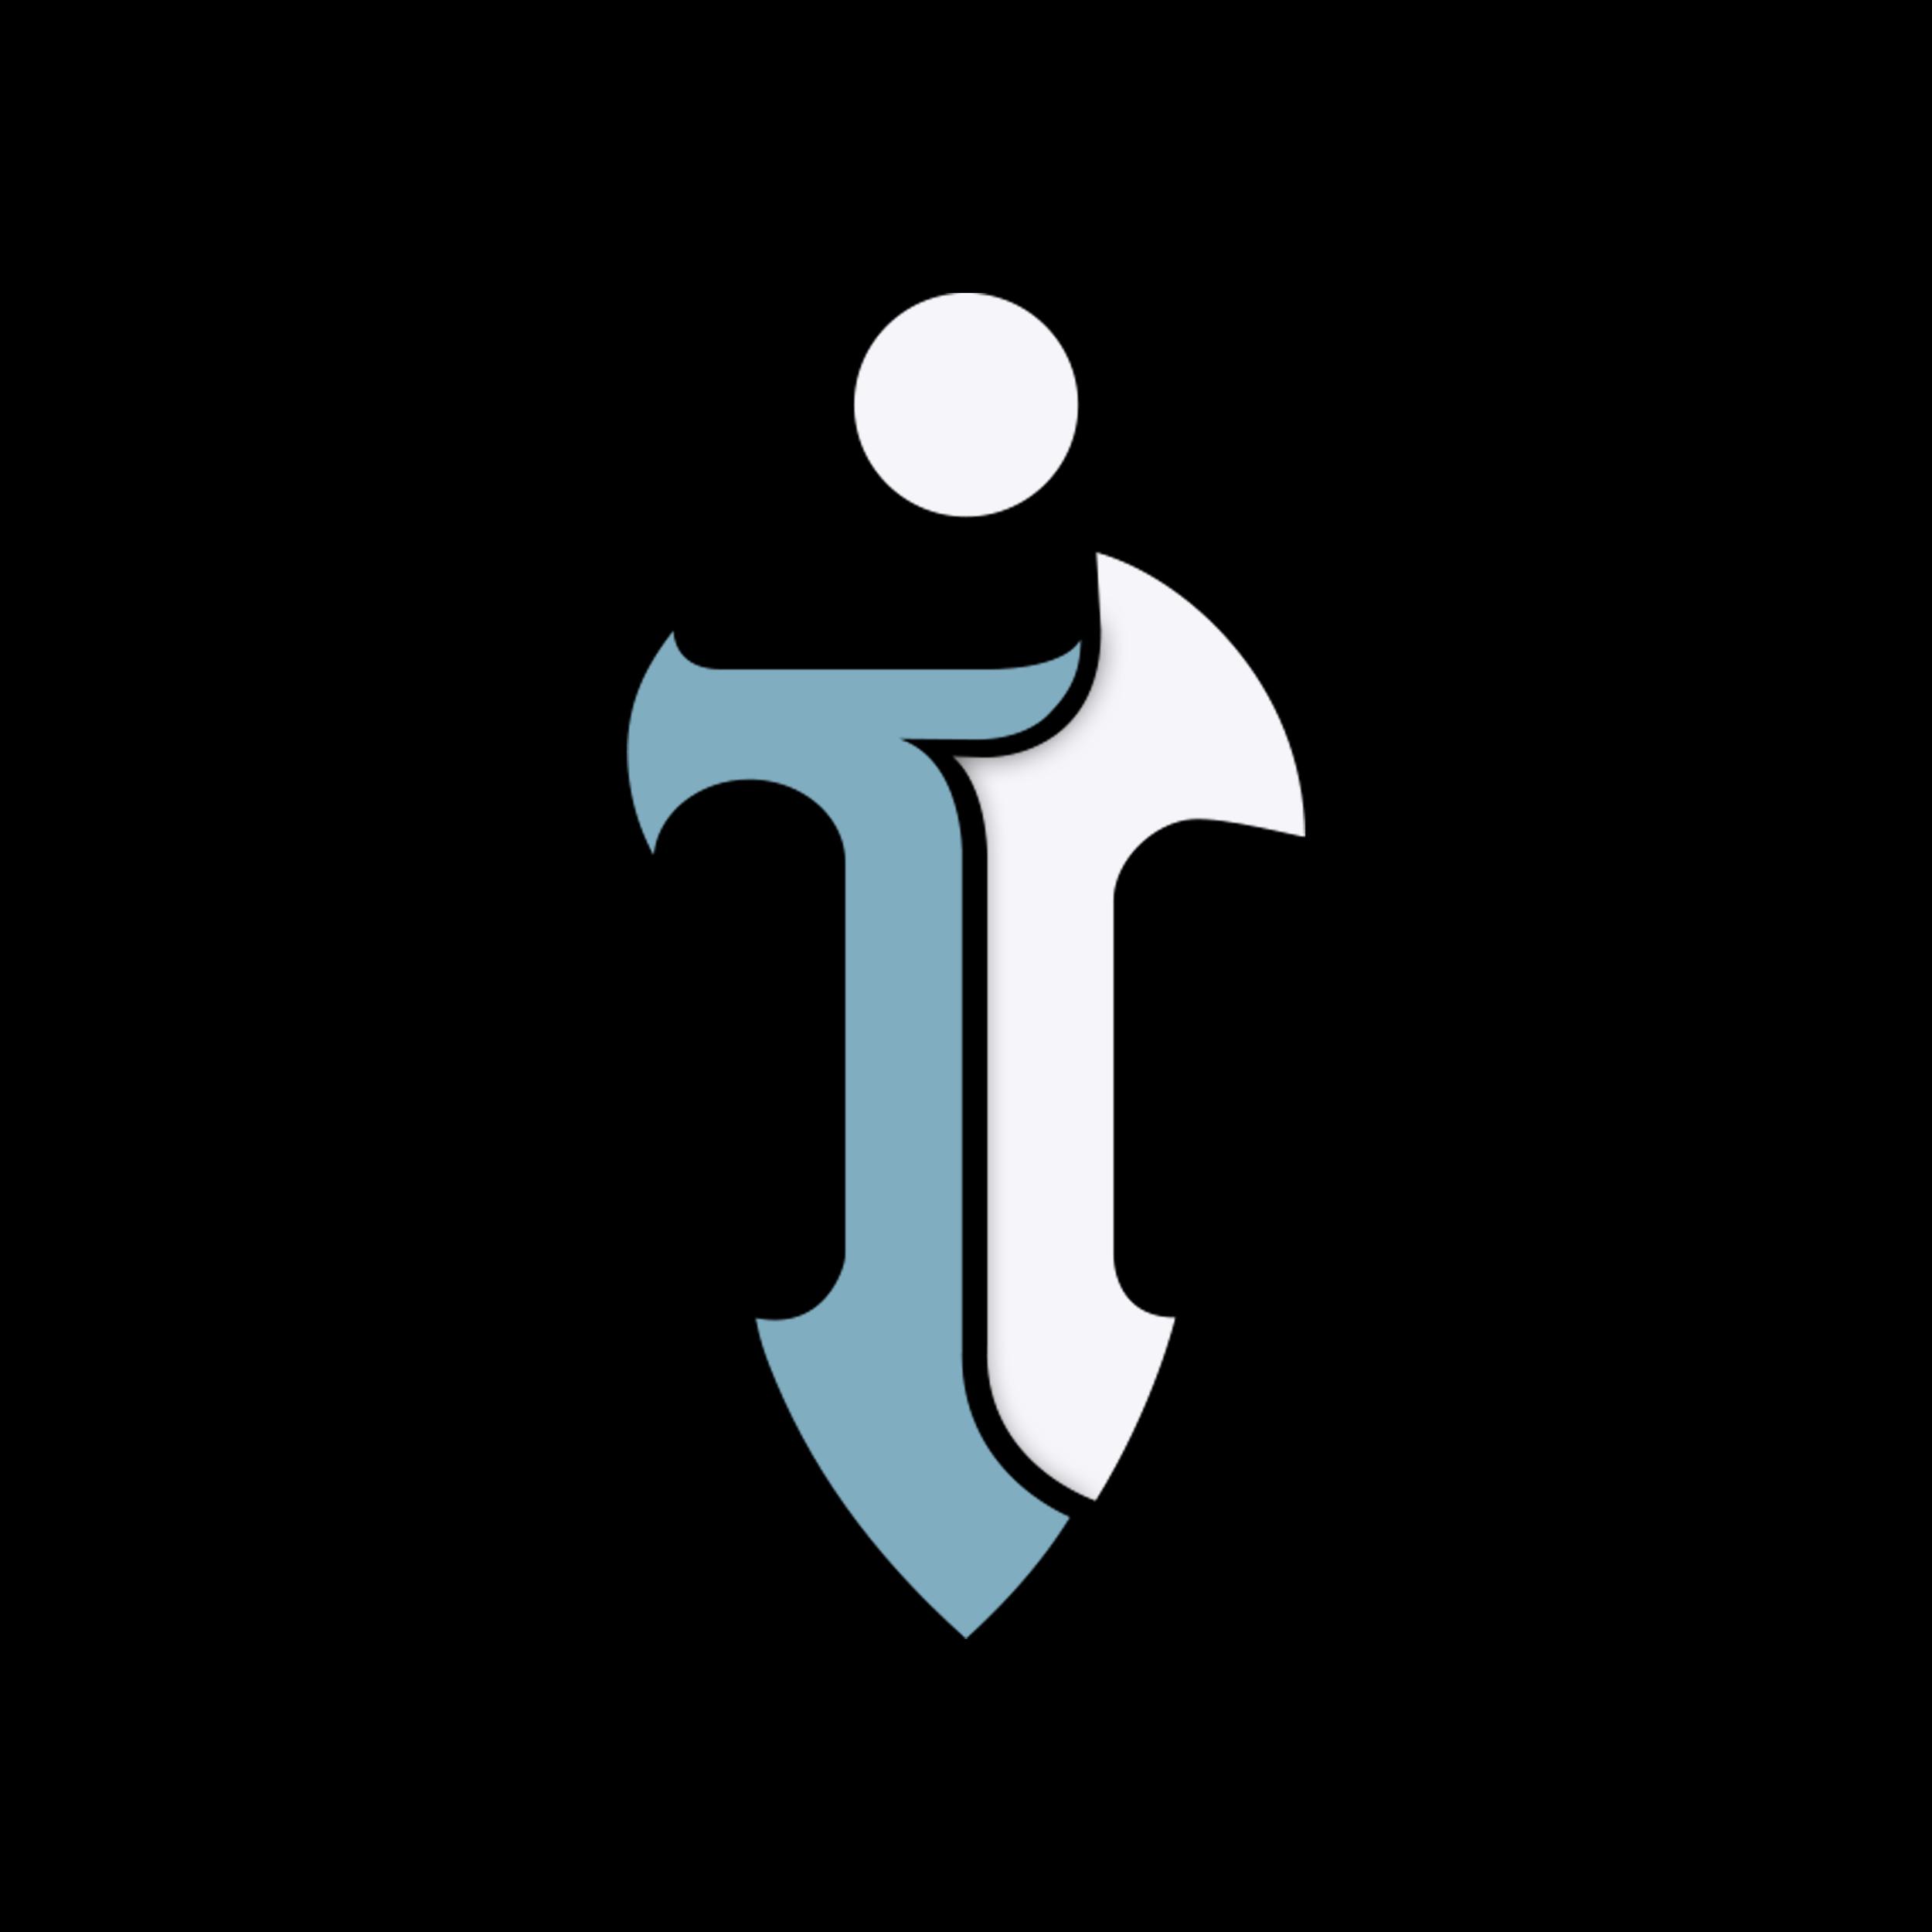 TI_Logo_Album_Symbol_On_Black_20181119_01_jp.png